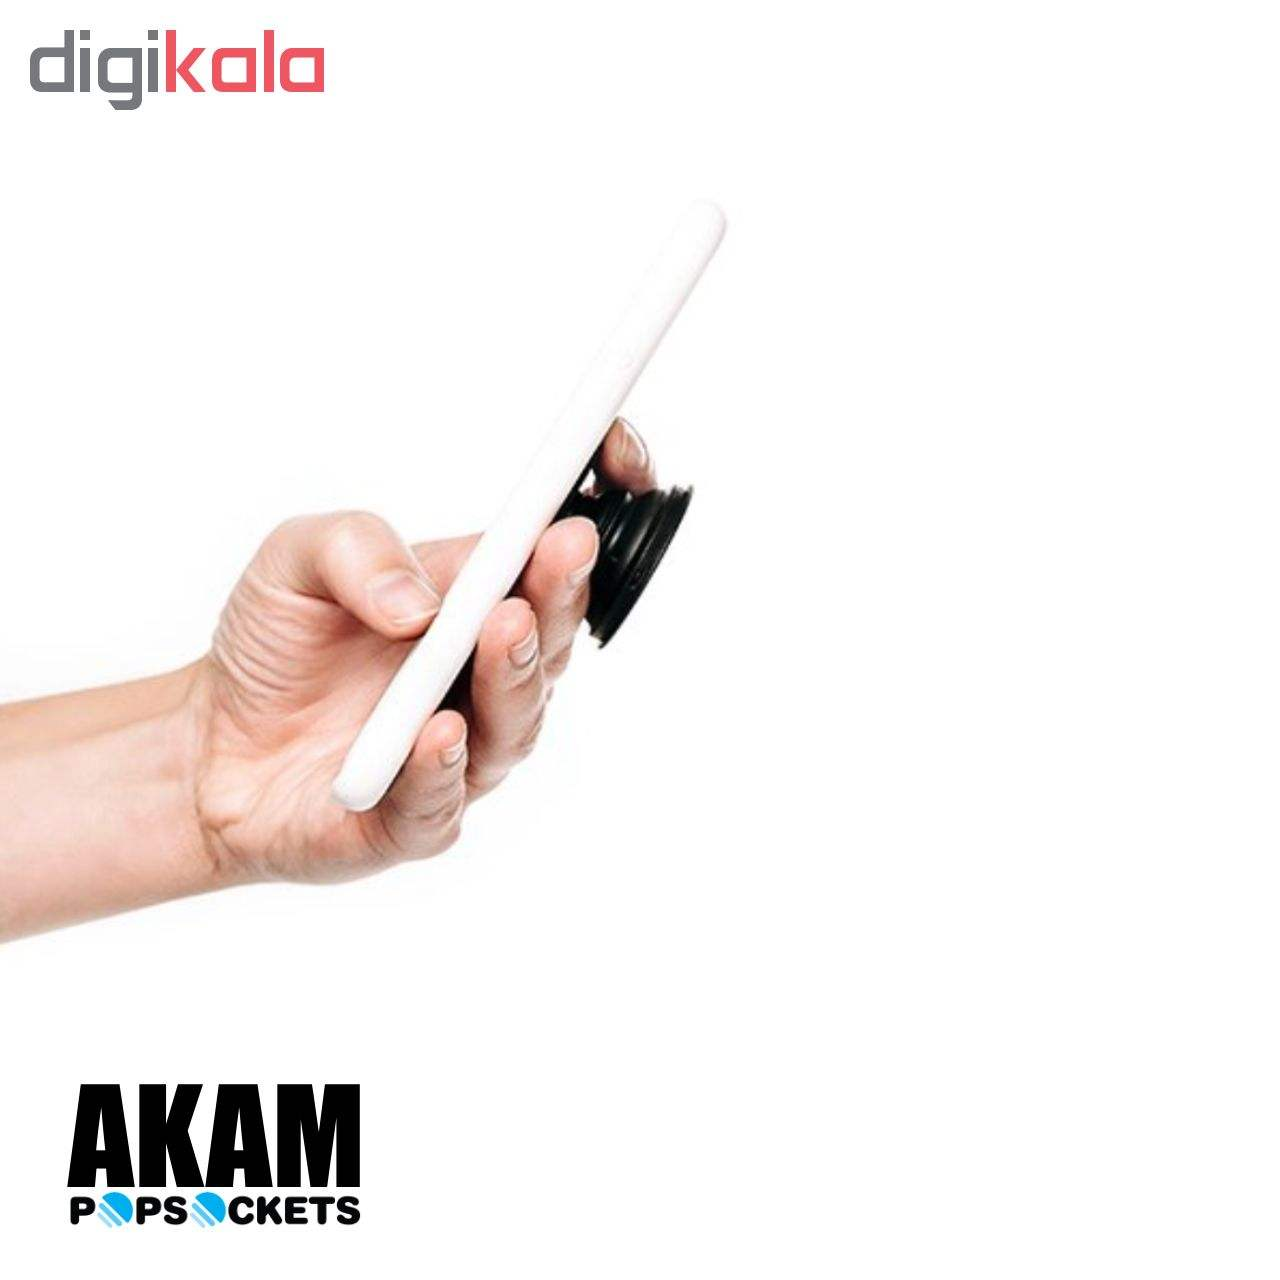 پایه نگهدارنده گوشی موبایل پاپ سوکت آکام مدل APS0111 main 1 9